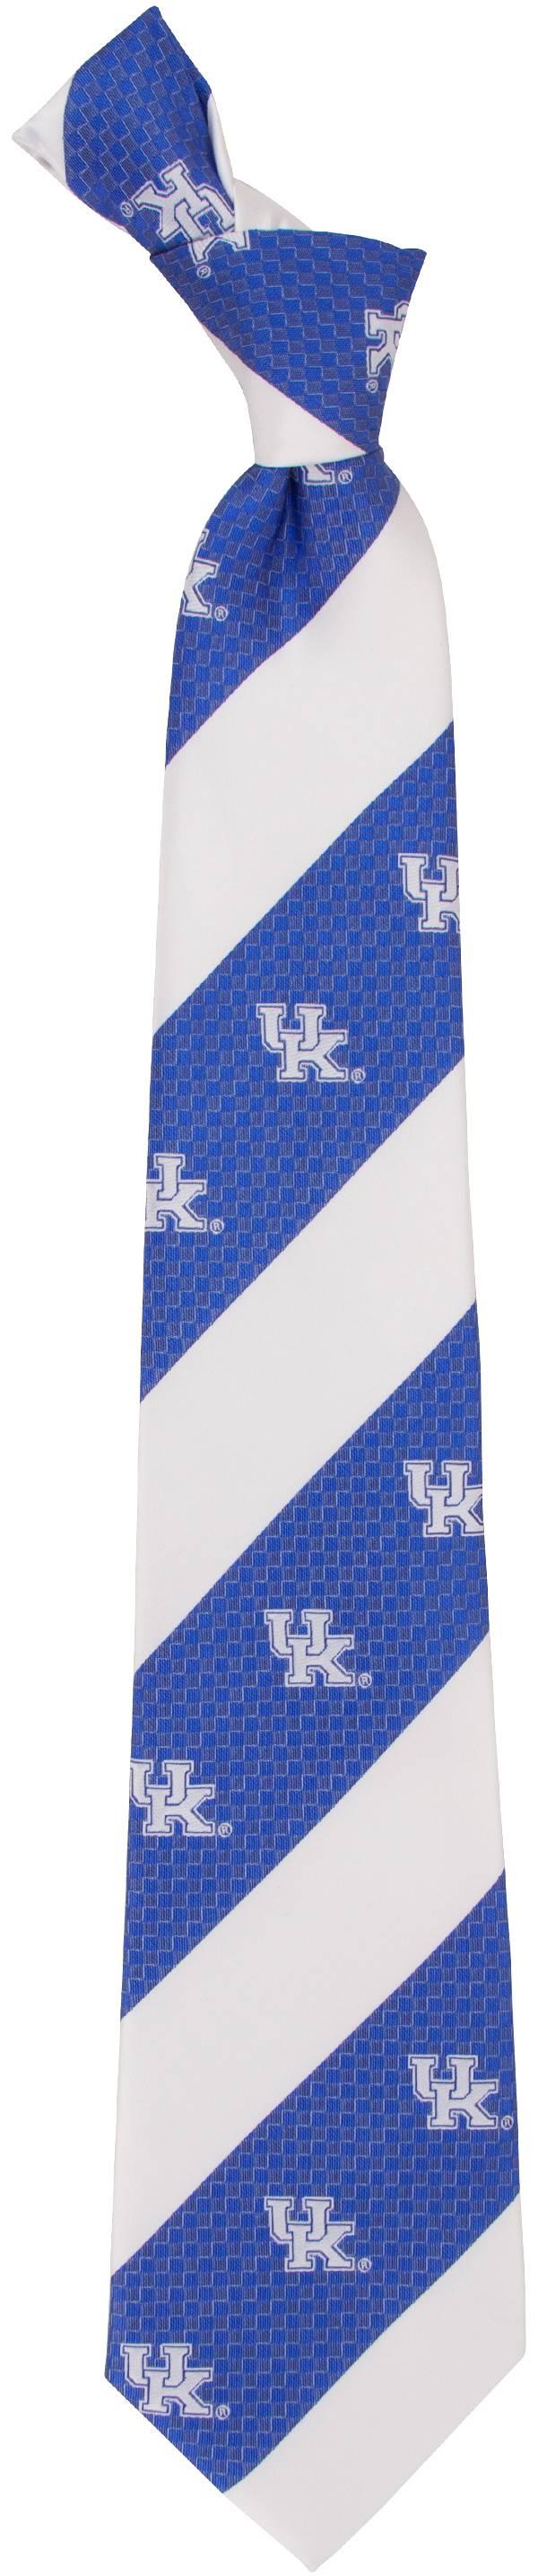 Eagles Wings Kentucky Wildcats Geo Stripe Necktie product image